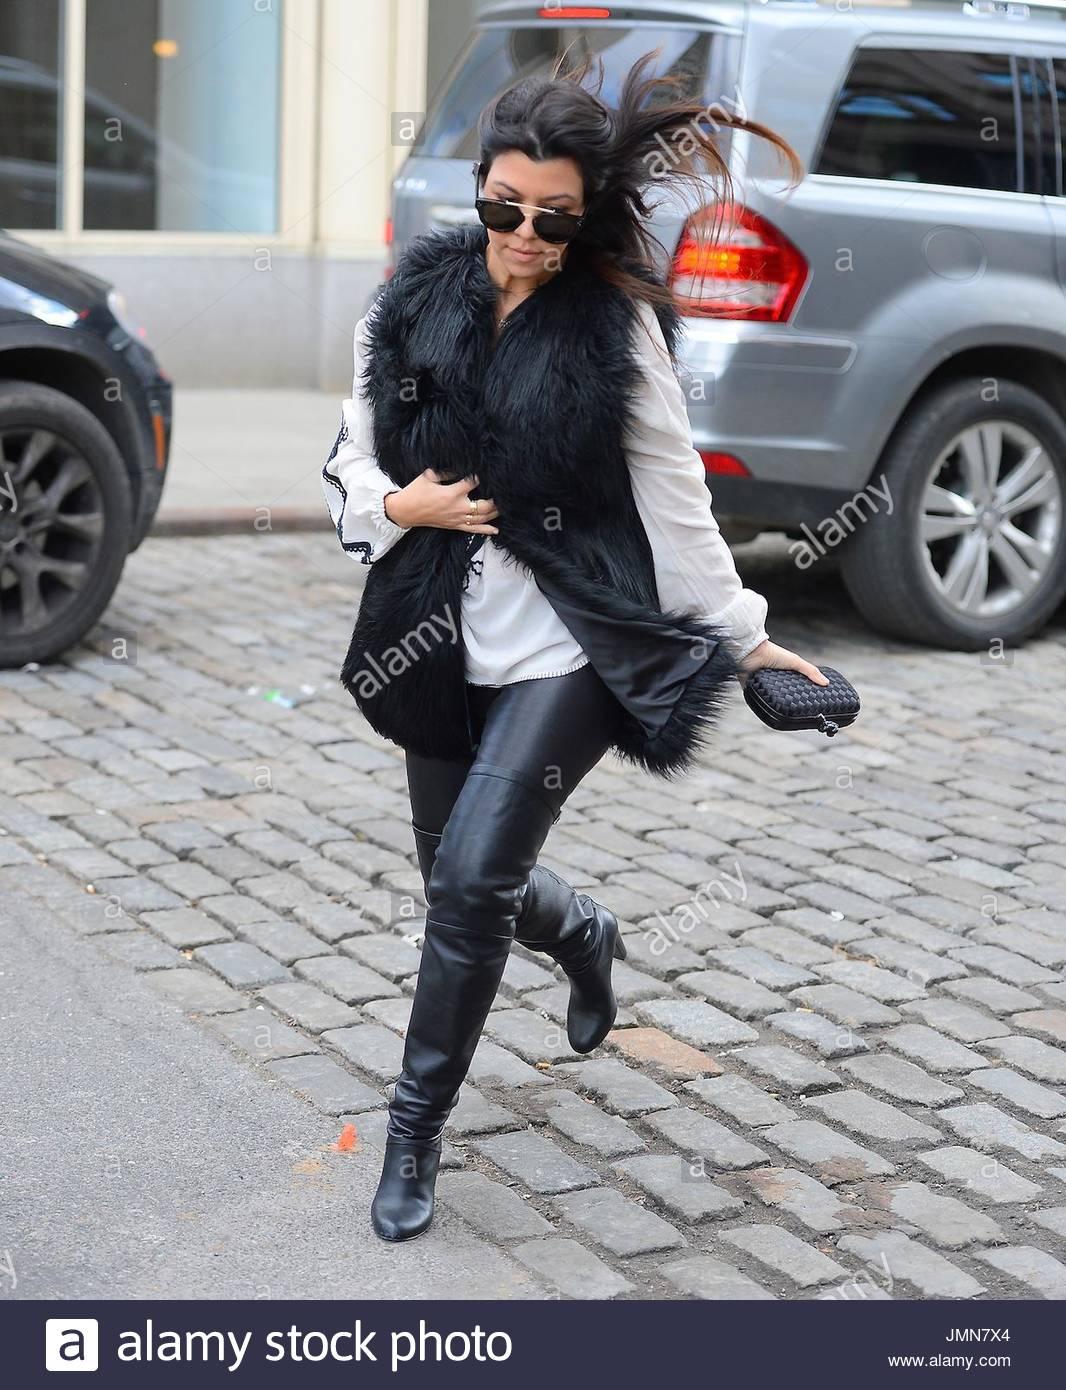 Kourtney Kardashian Kourtney Kardashian Was Spotted Shopping For